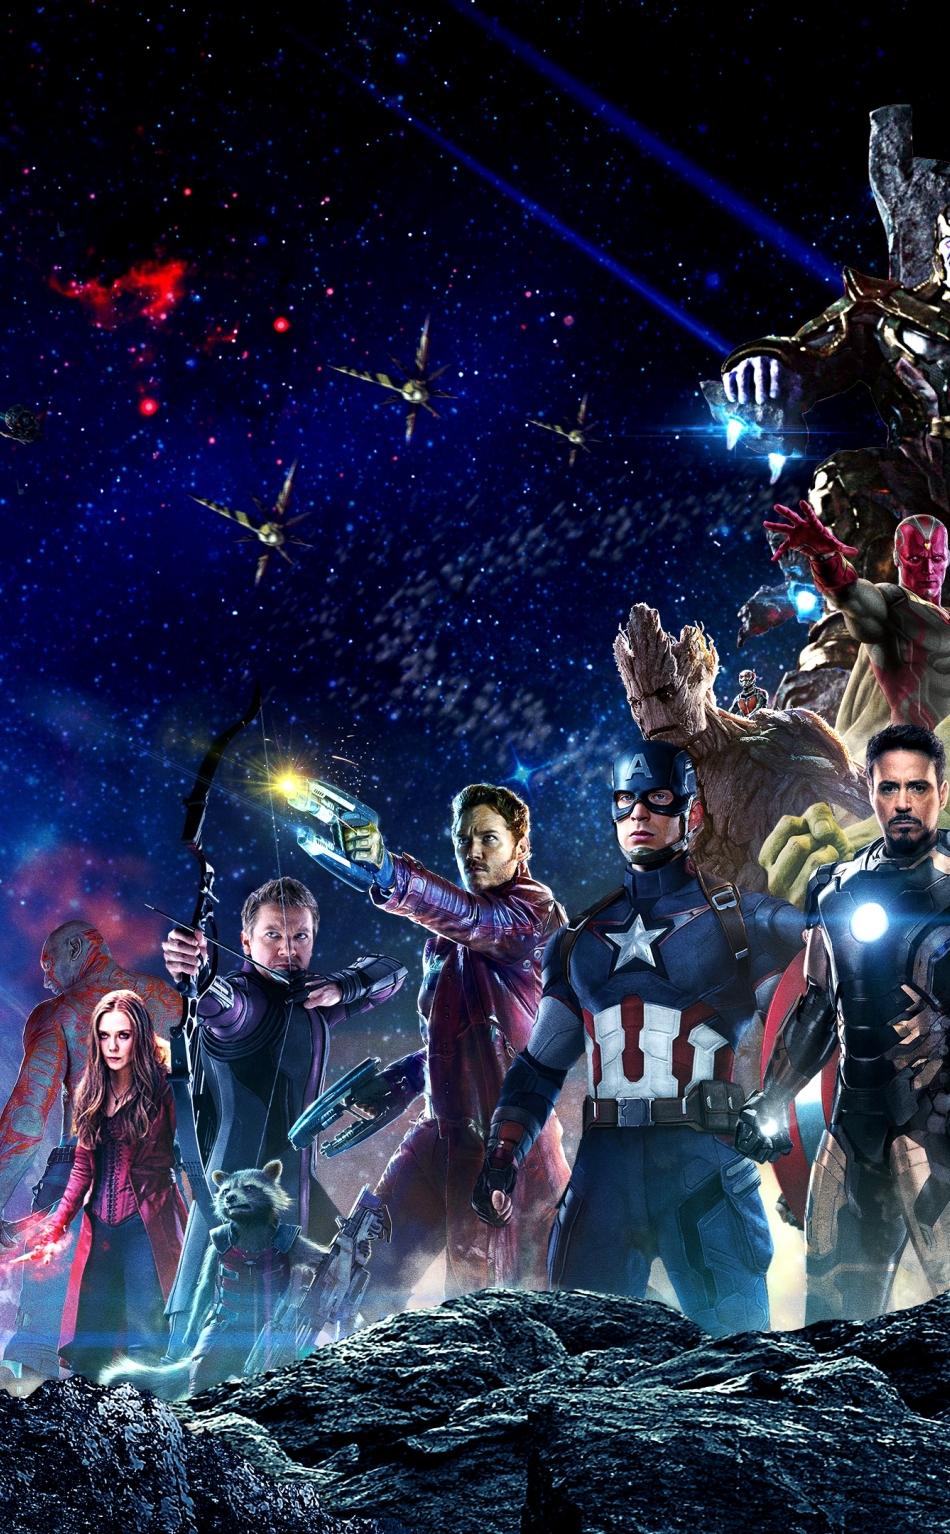 Avengers infinity war all superhero characters hd 4k - Avengers superhero wallpaper ...